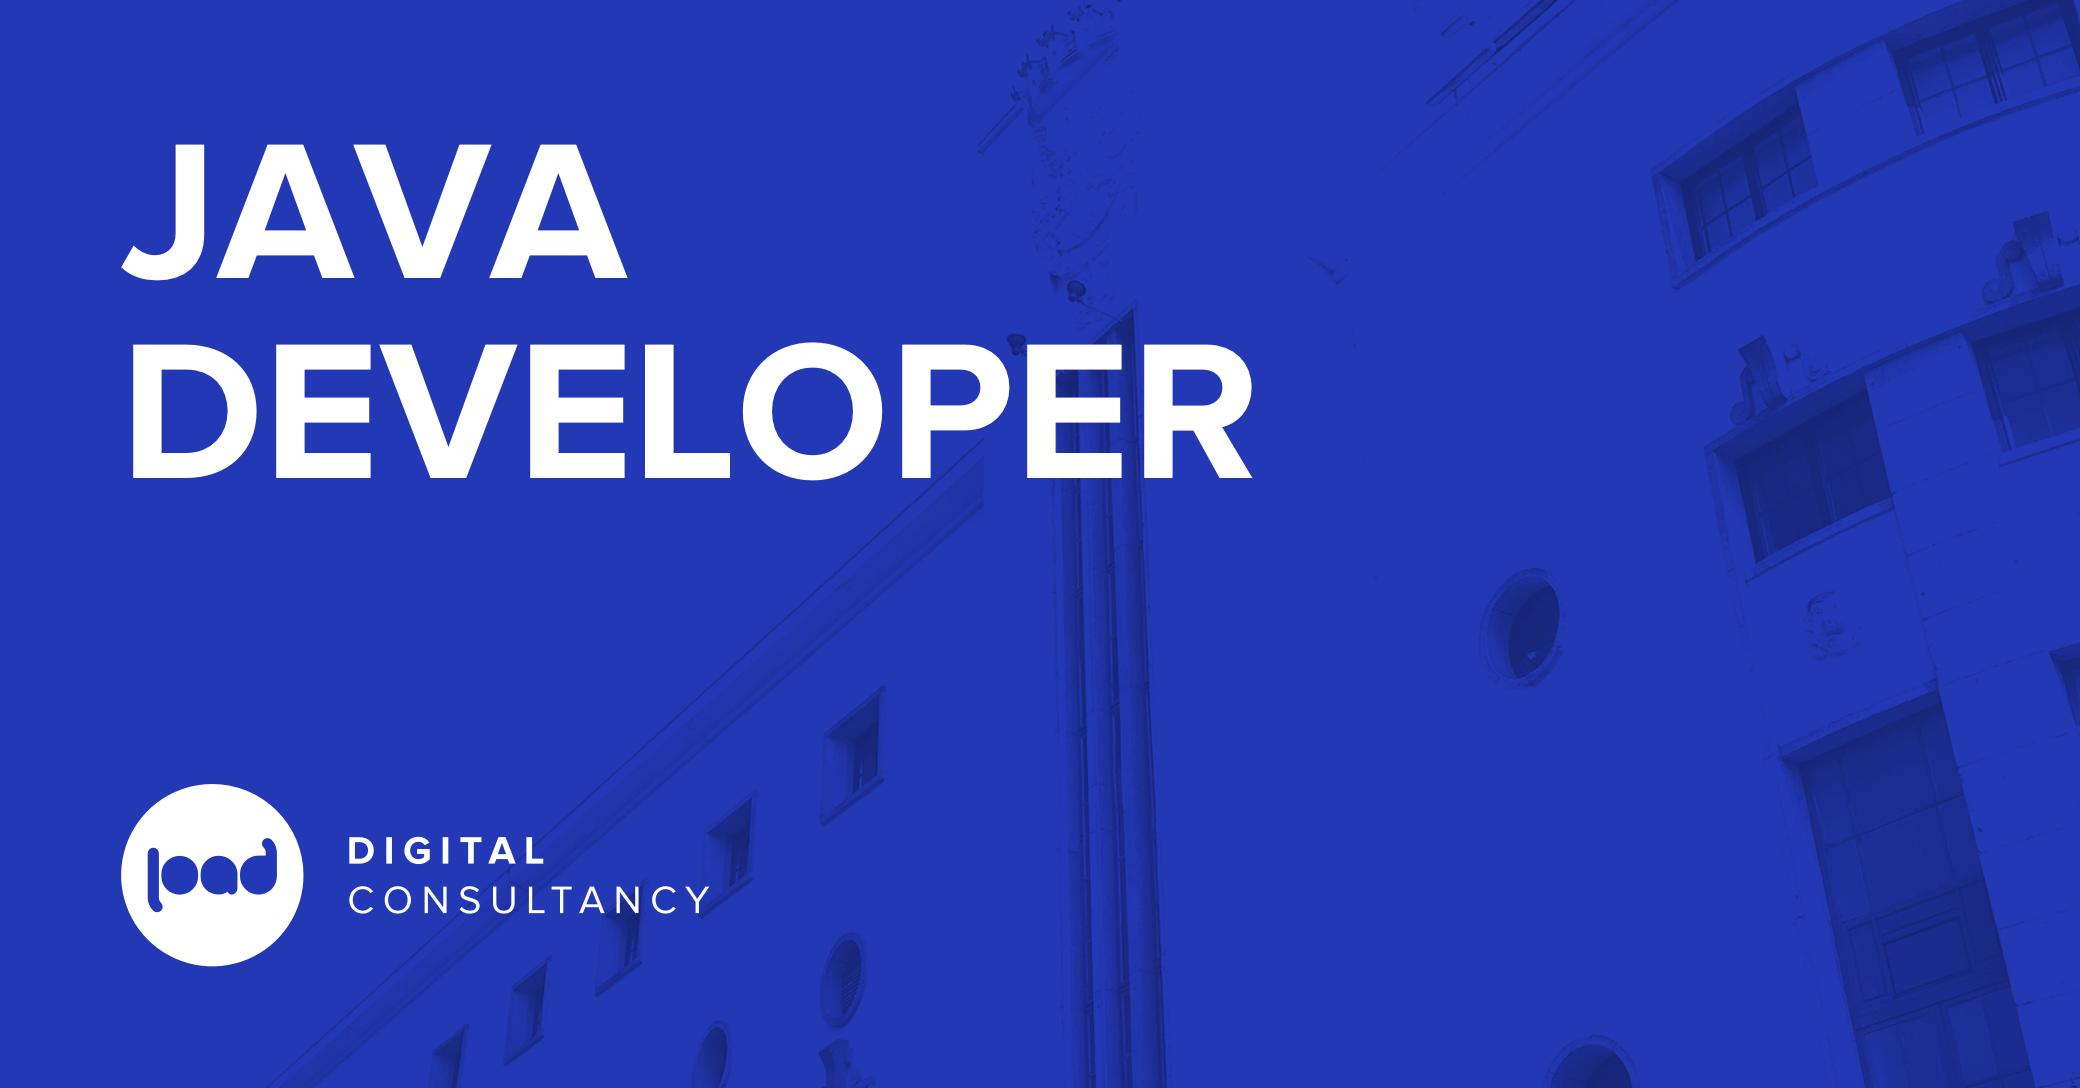 Java Developer@2x.png